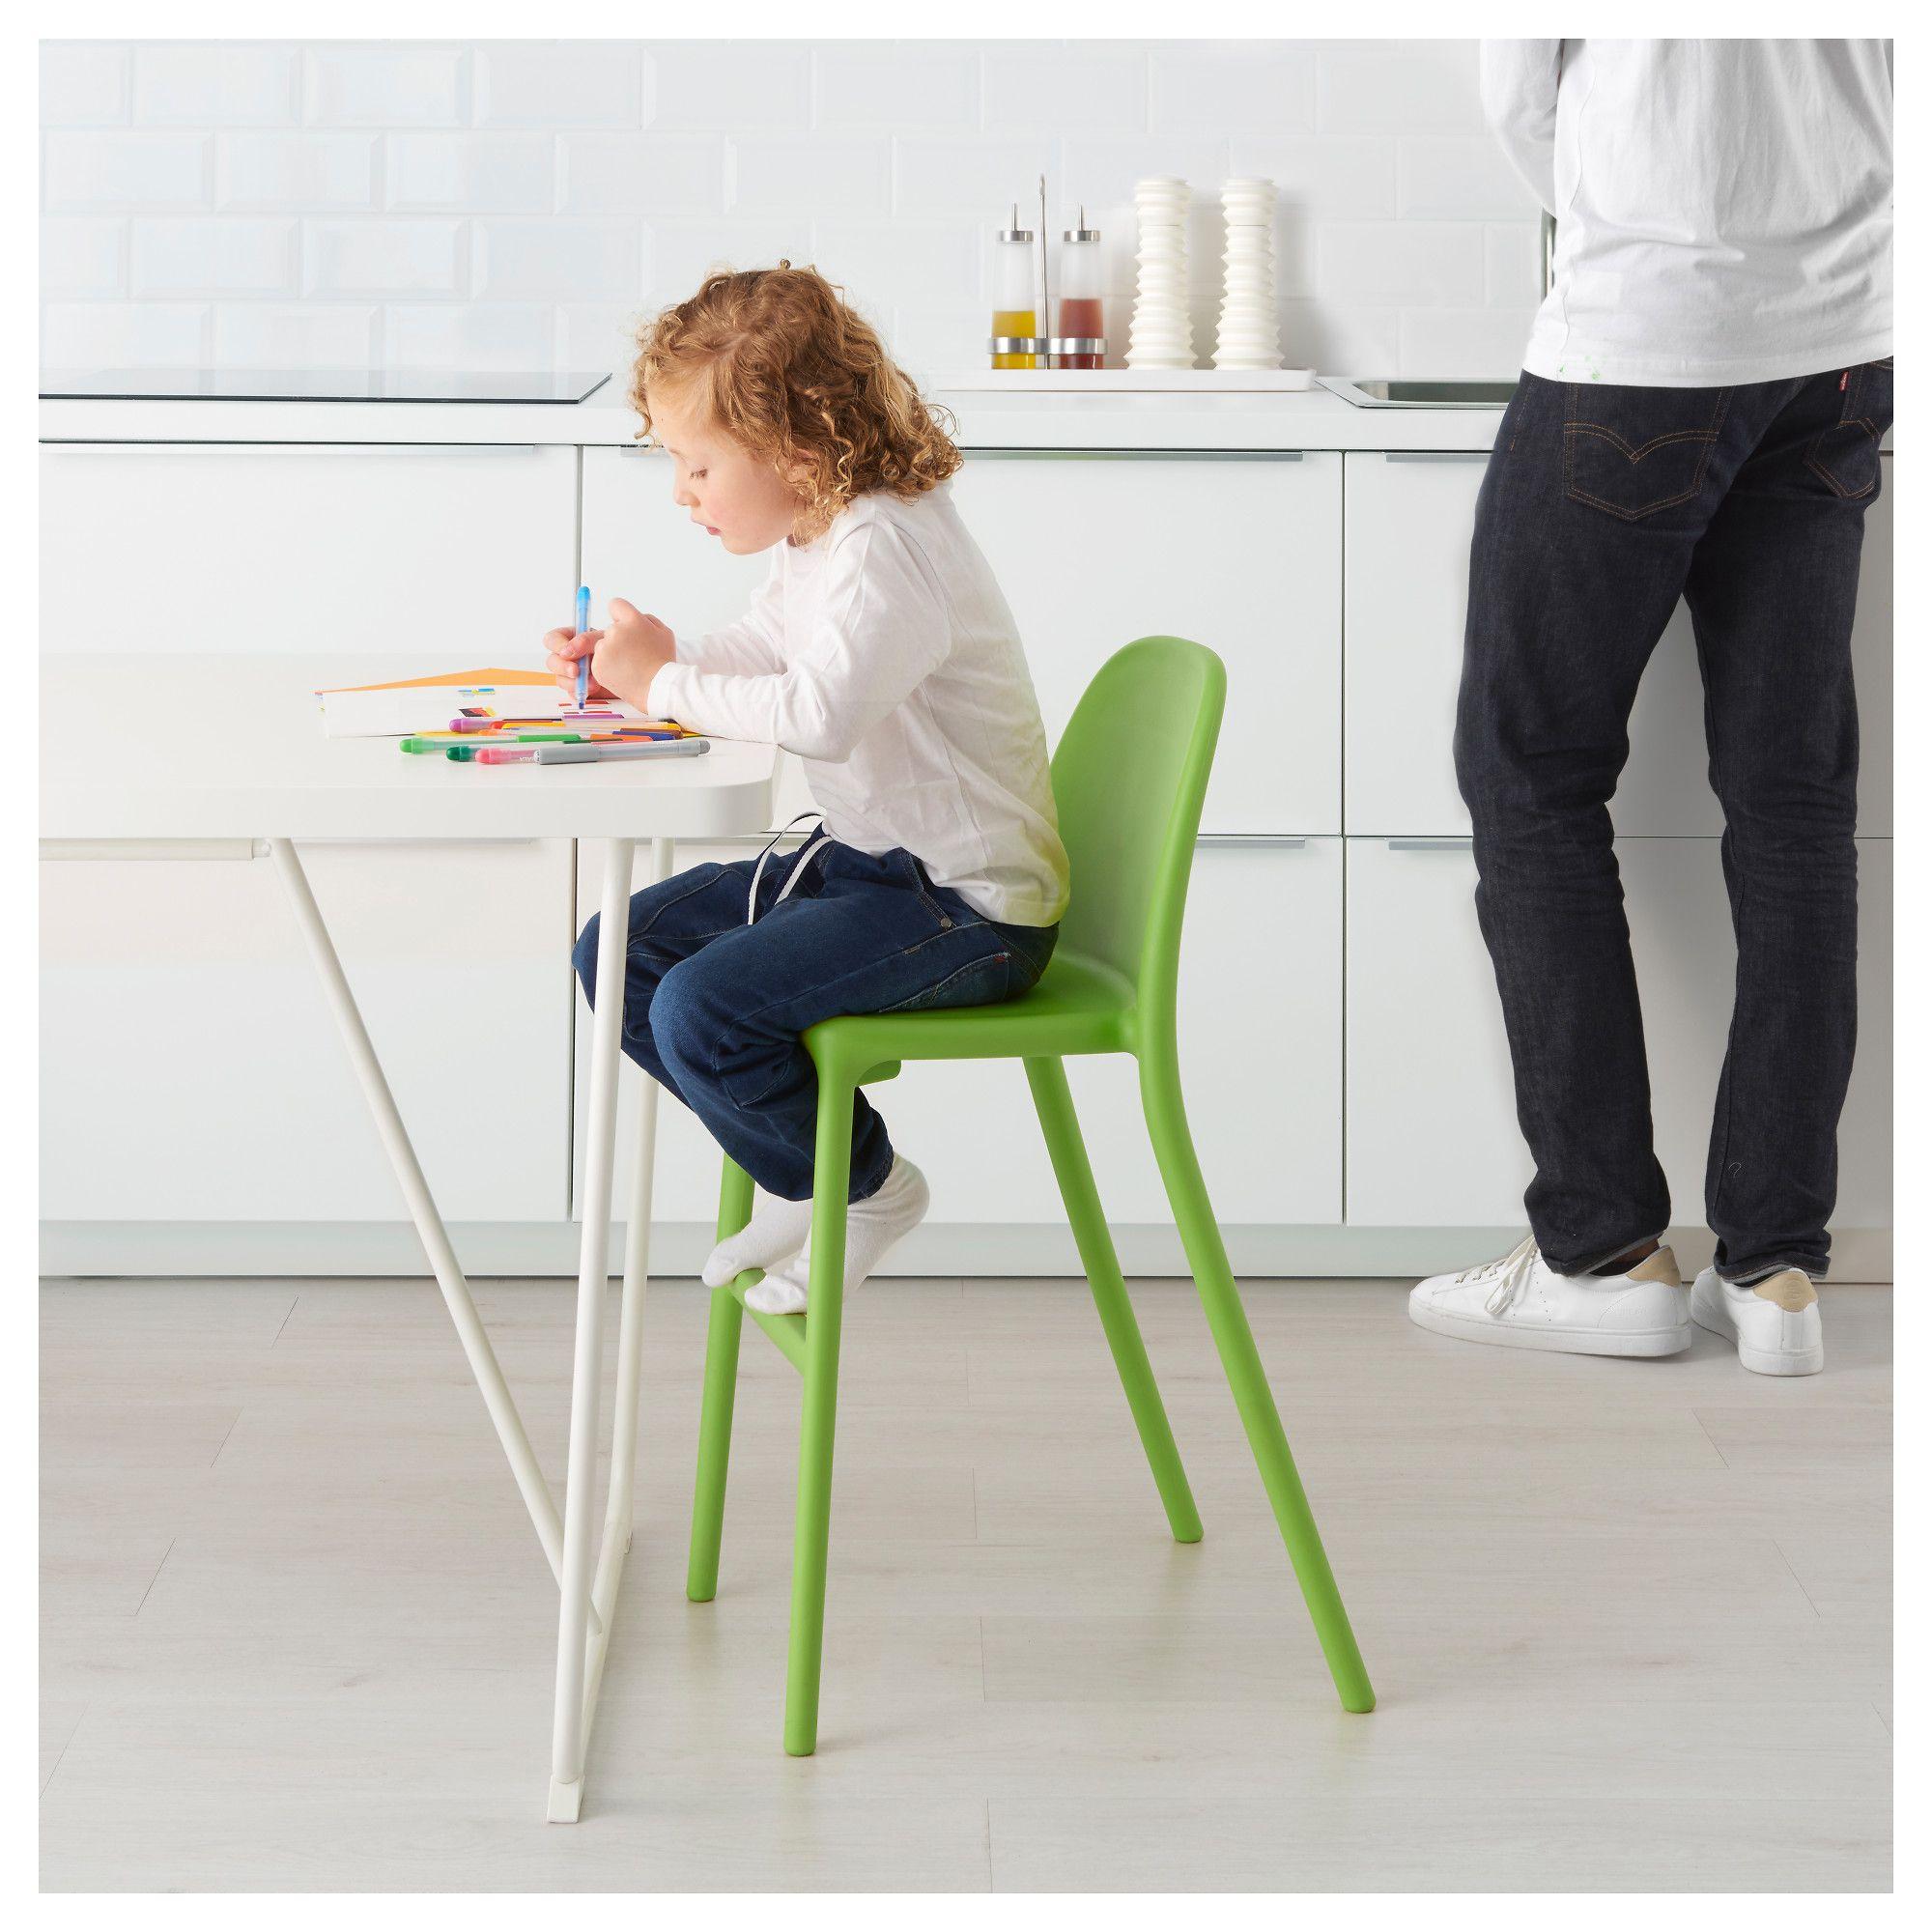 Furniture and Home Furnishings Ikea junior chair, Ikea